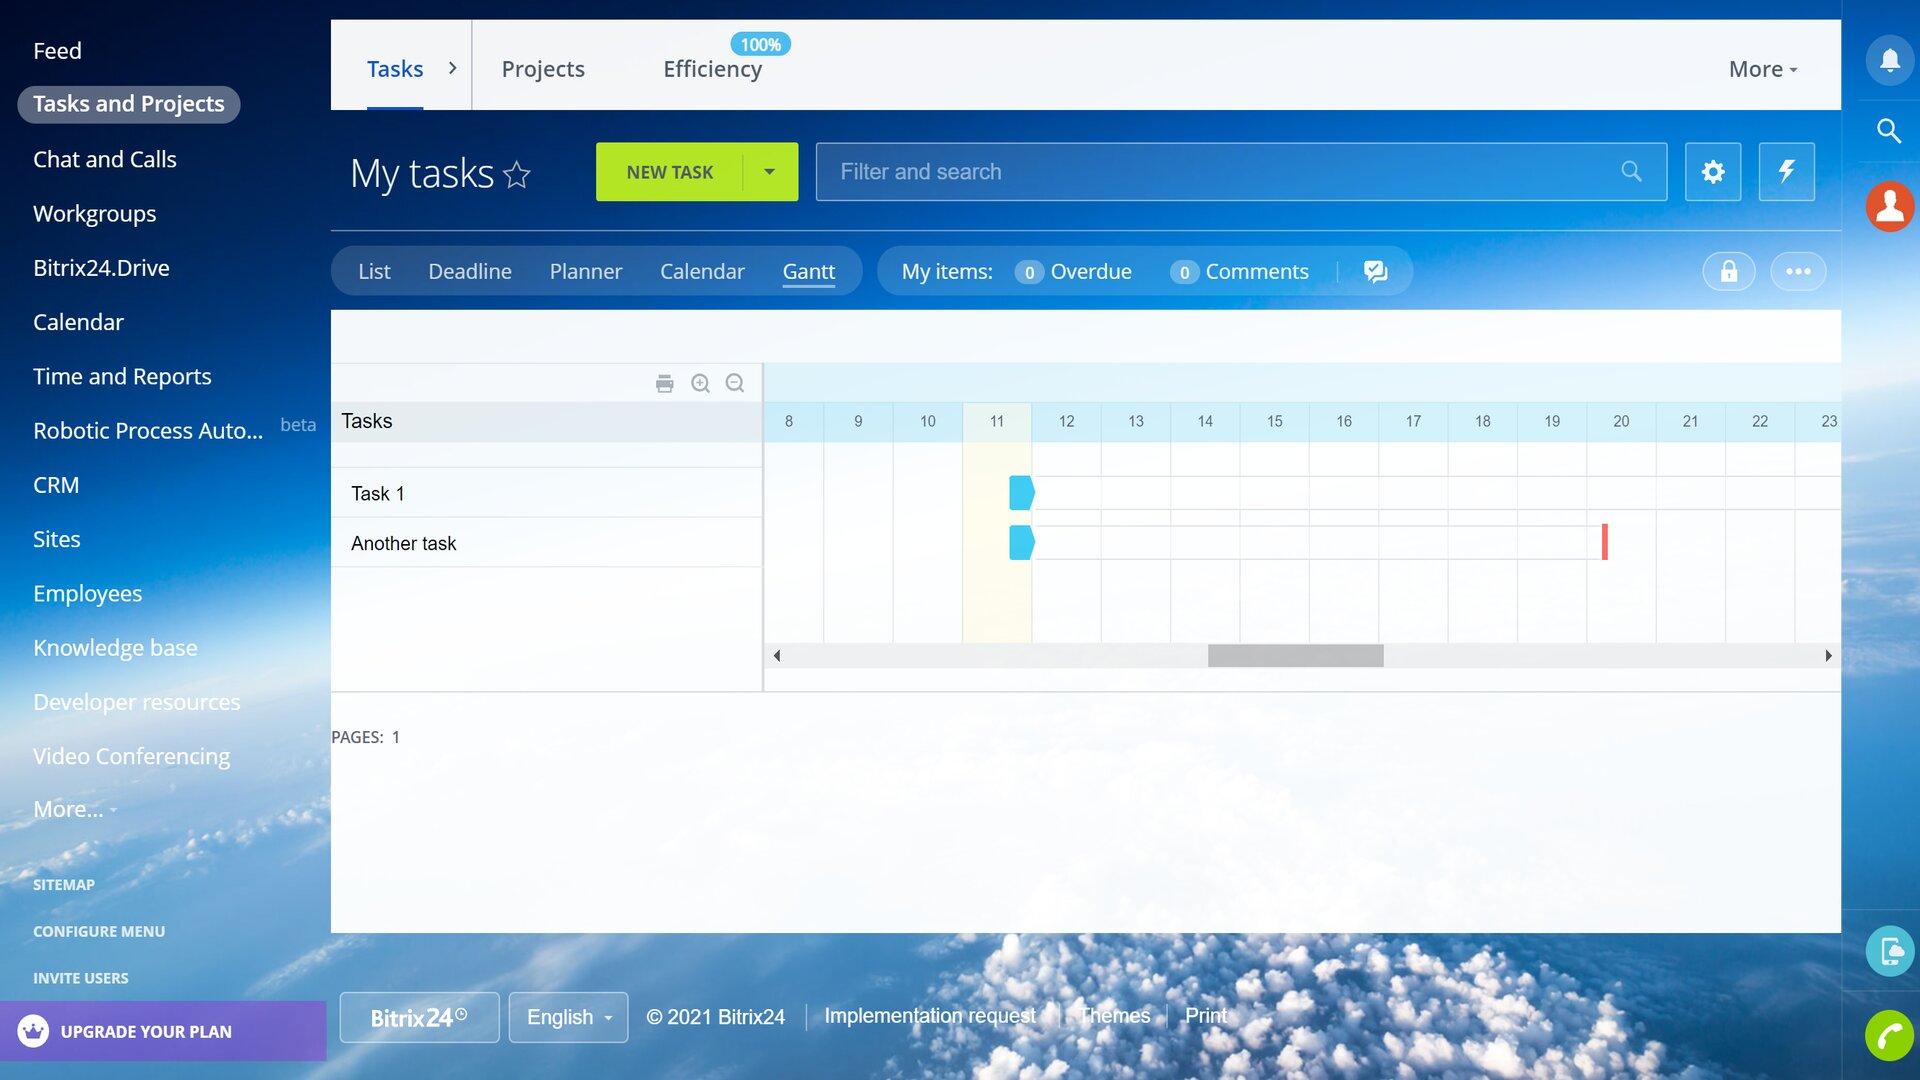 Bitrix24's project management screen